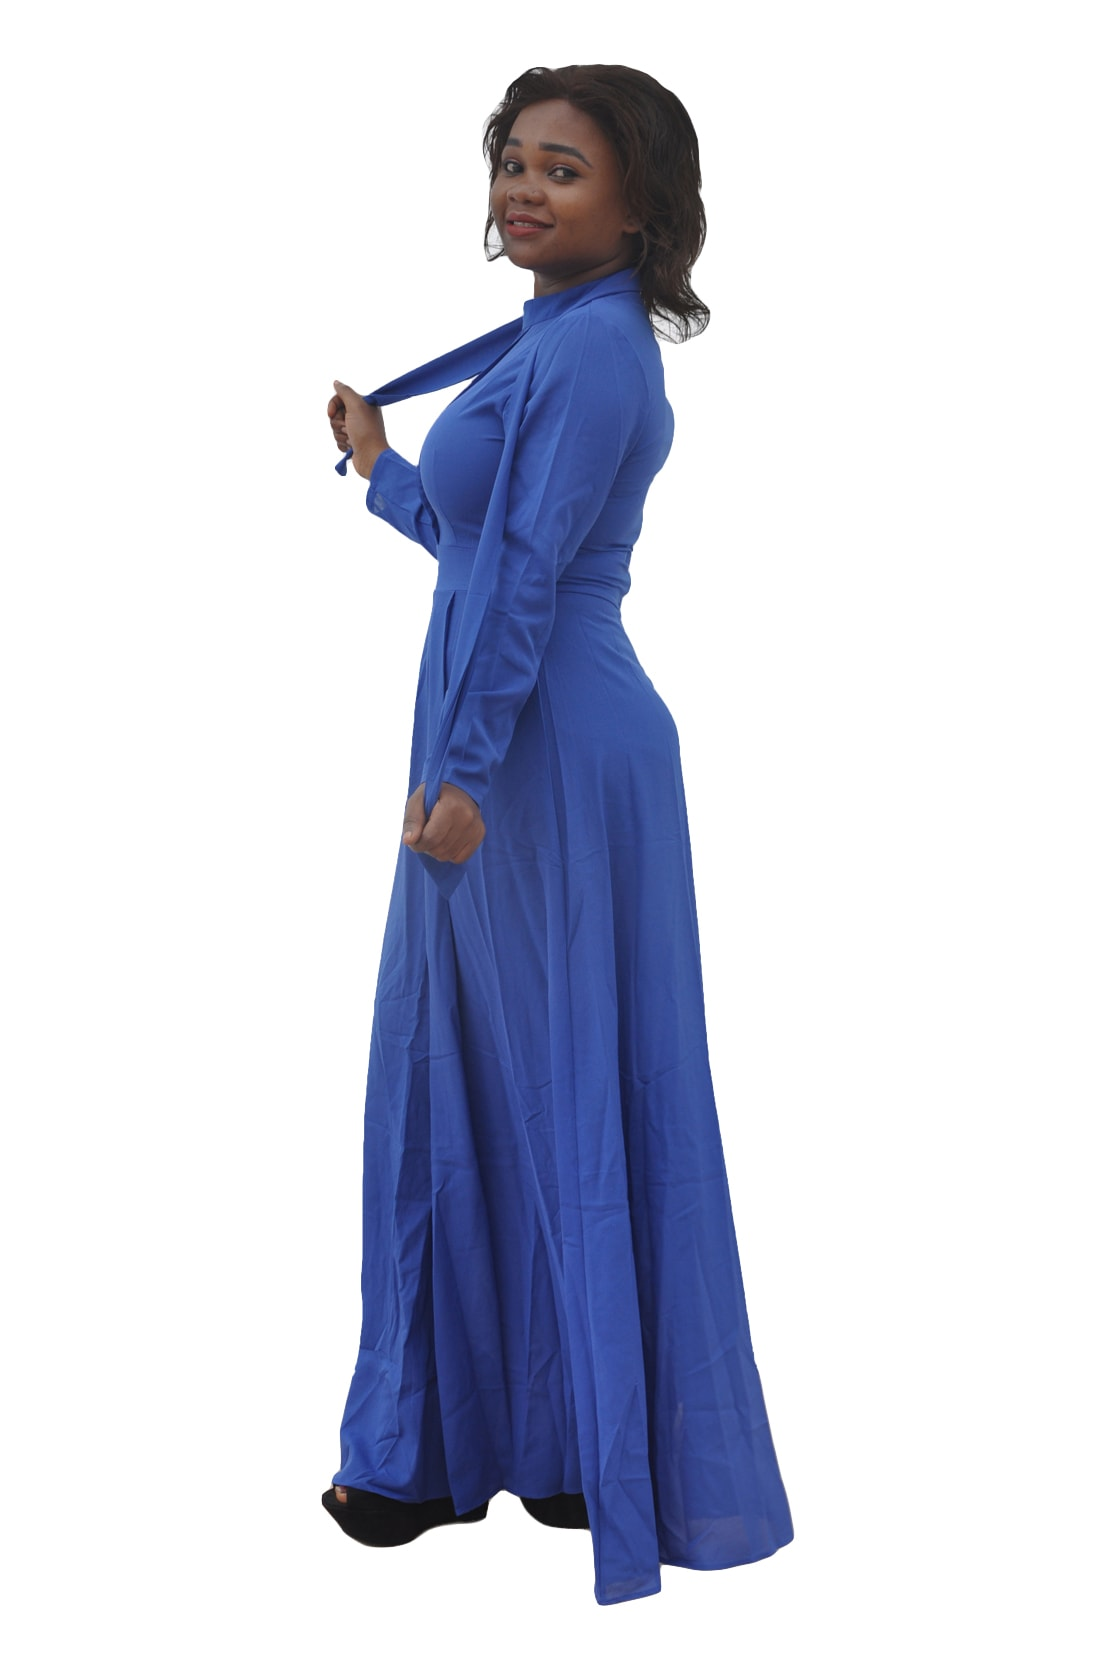 M0293 blue4 Long Sleeve Dresses maureens.com boutique